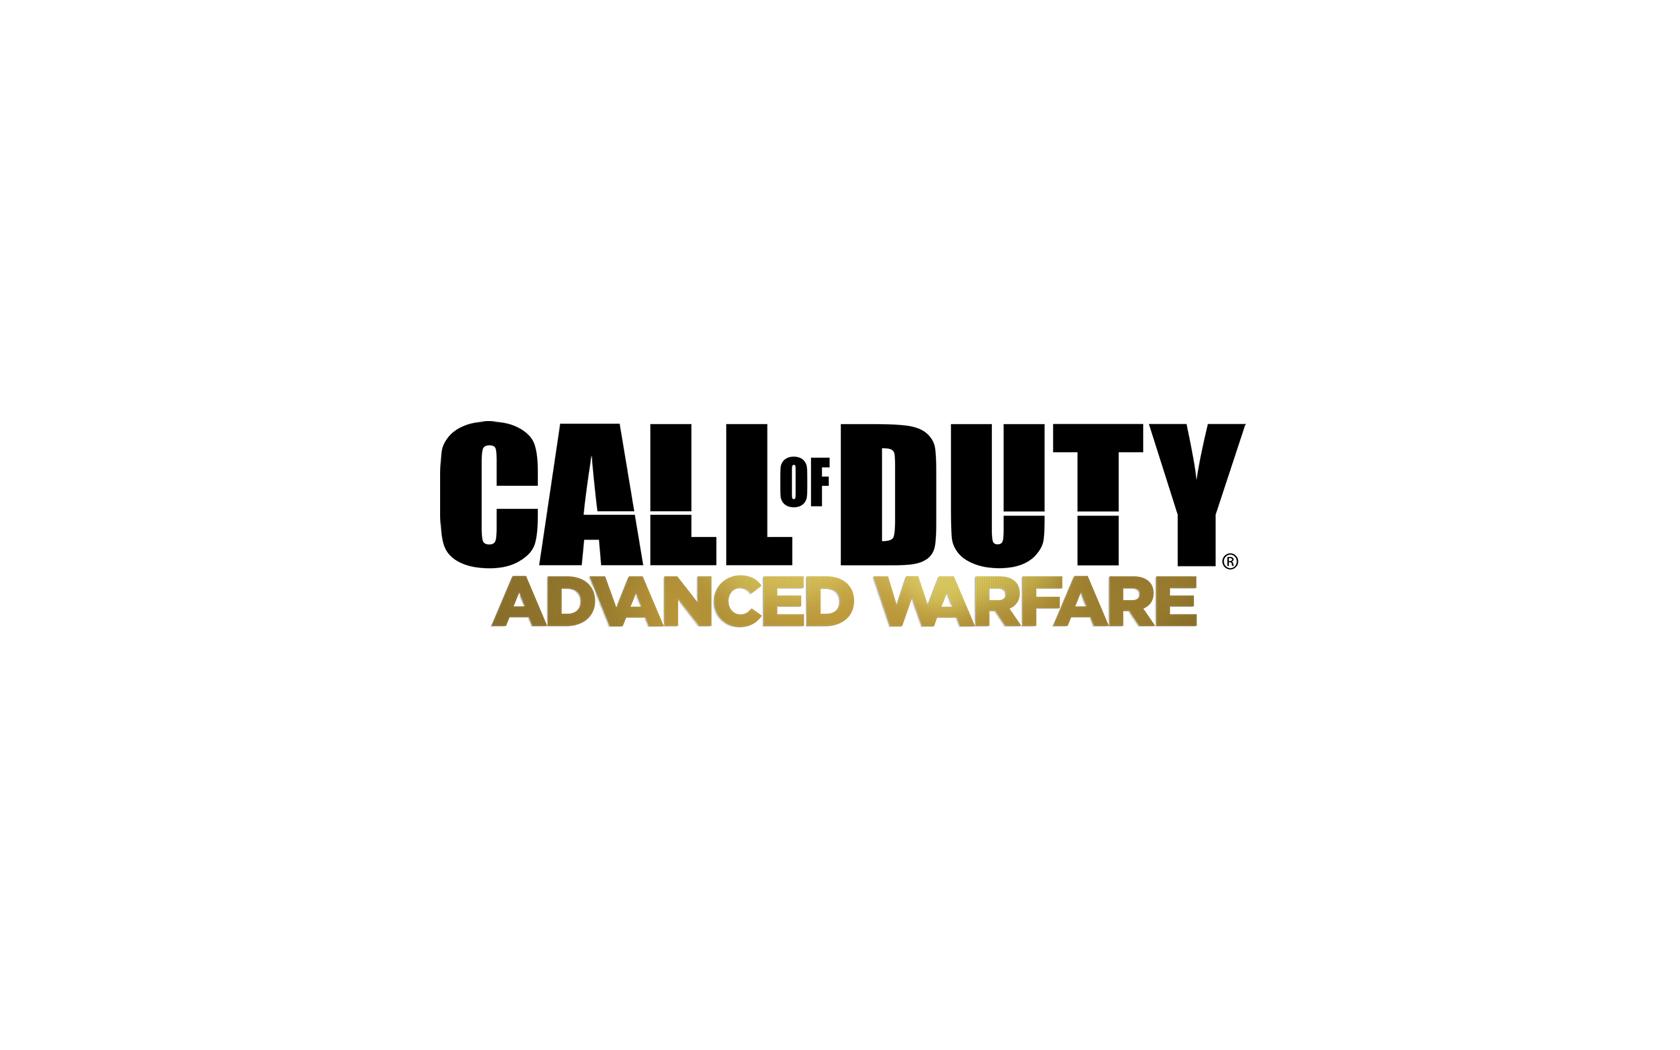 call of duty advanced warfare logo wallpaper 40671